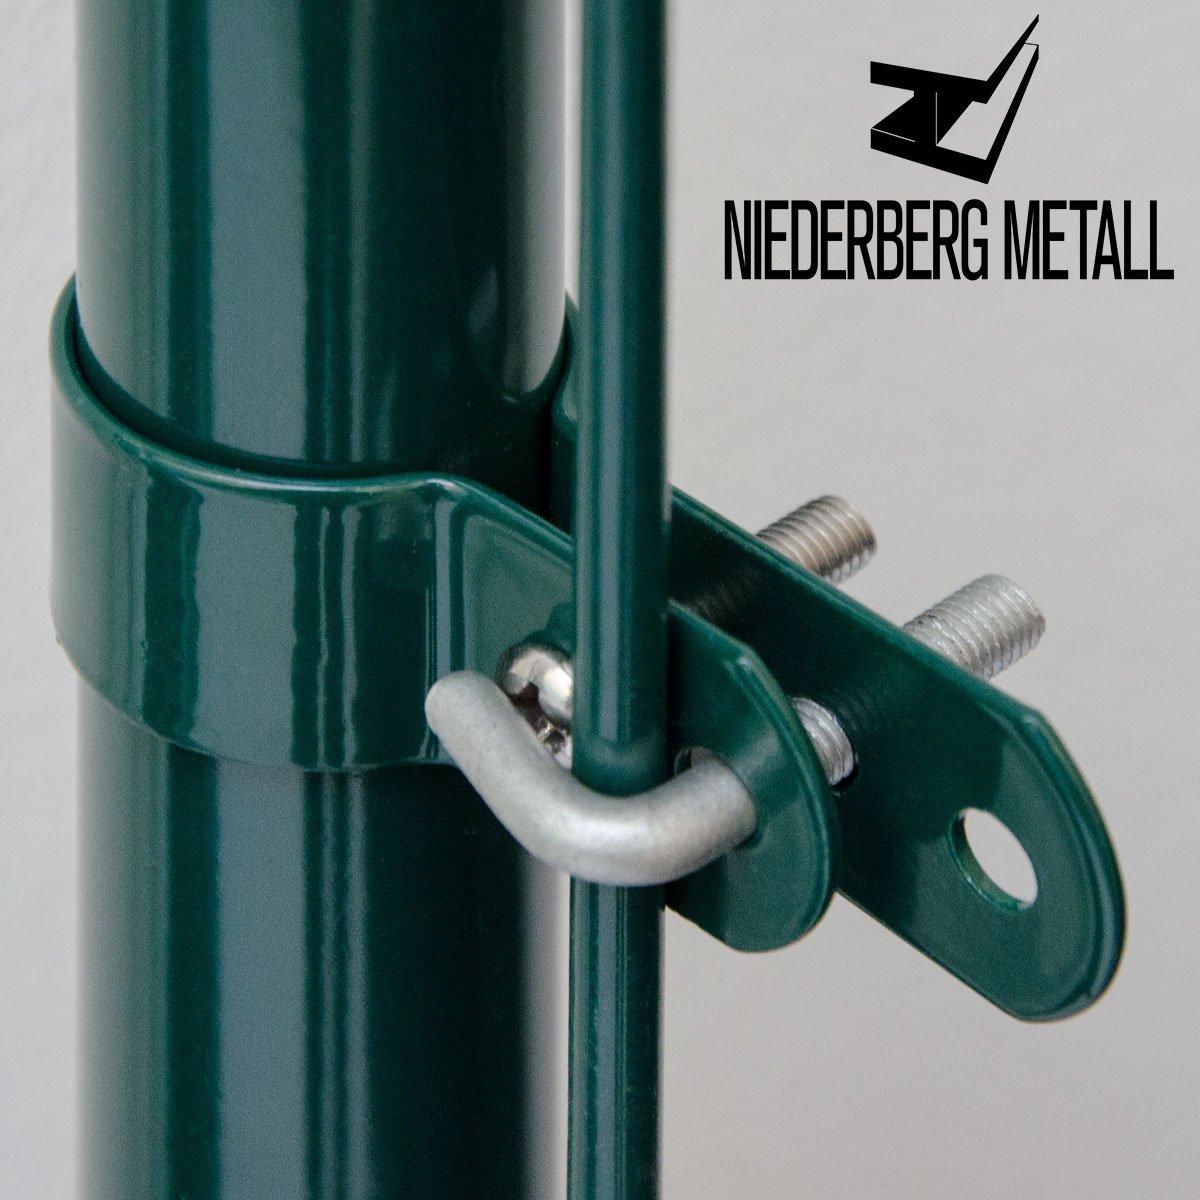 NIEDERBERG METALL Schelle ˜34mm Befestigungsschelle Metall